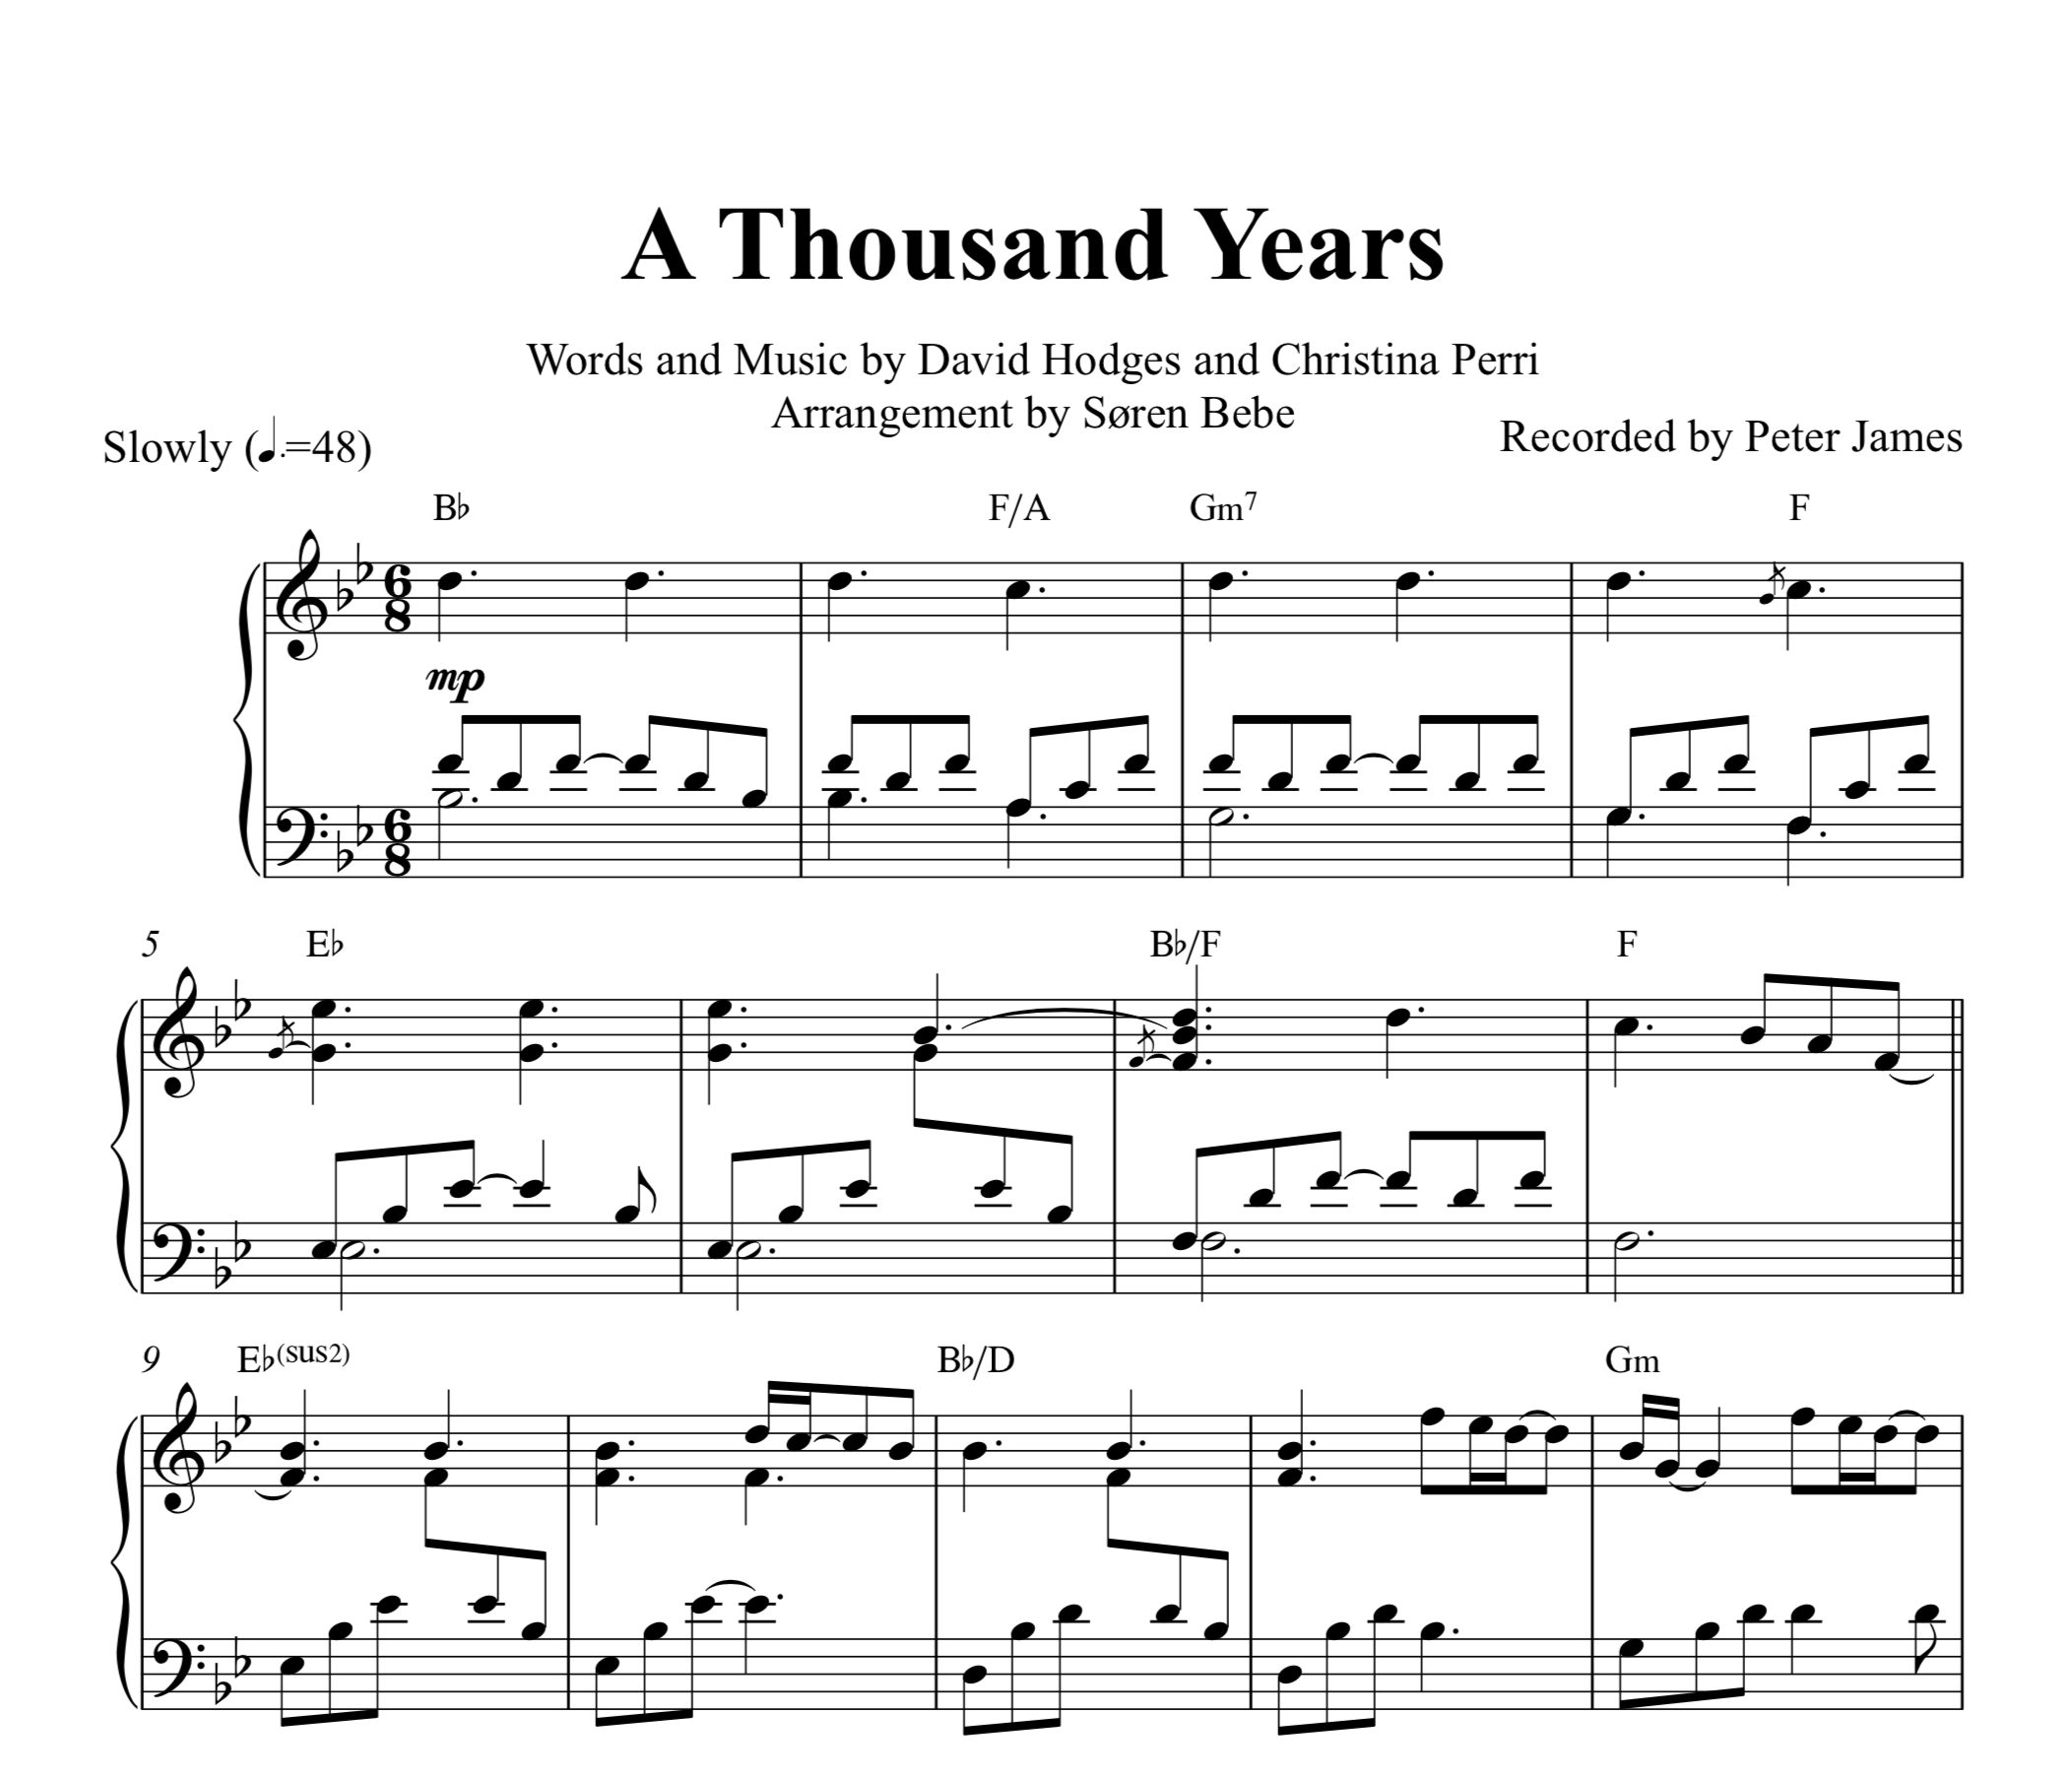 A Thousand Years (Christina Perri) Piano Sheet Music (Pdf) | Music - Free Printable Music Sheets Pdf